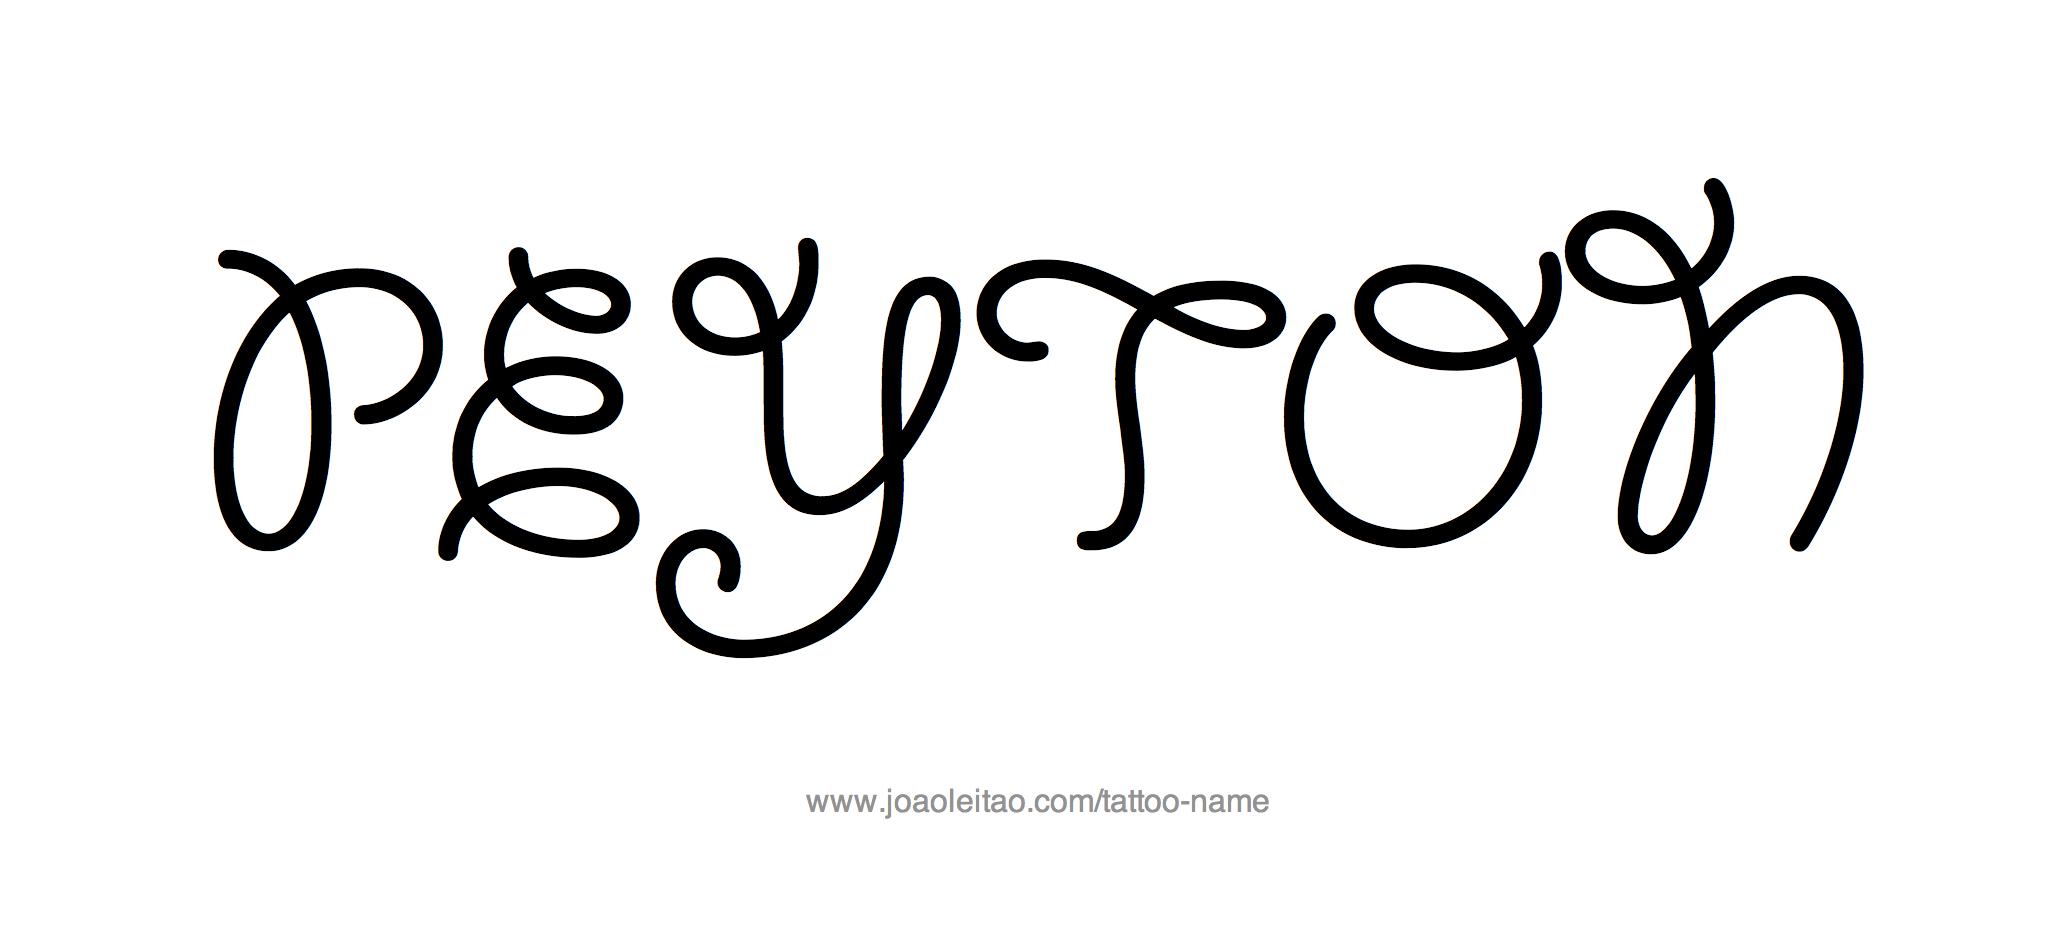 Name tattoo designs free - Tattoo Design Name Peyton